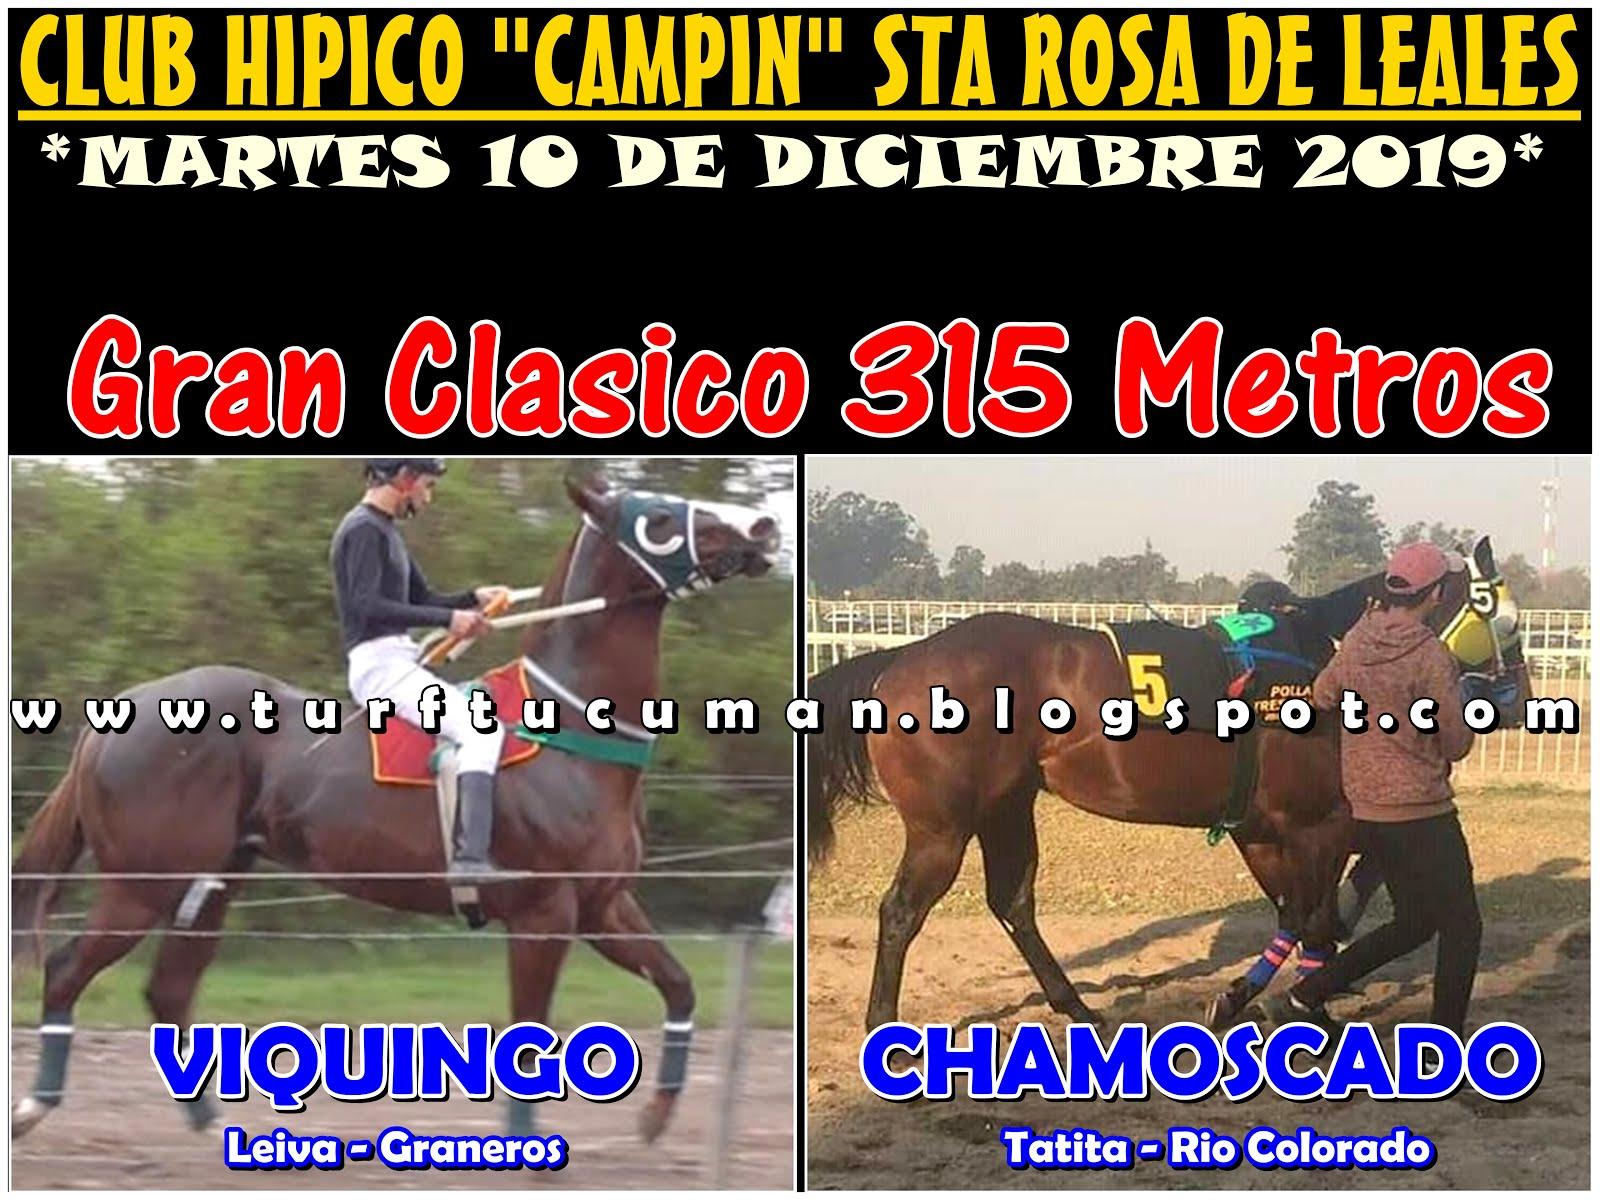 VIQUINGO VS CHAMOSCADO